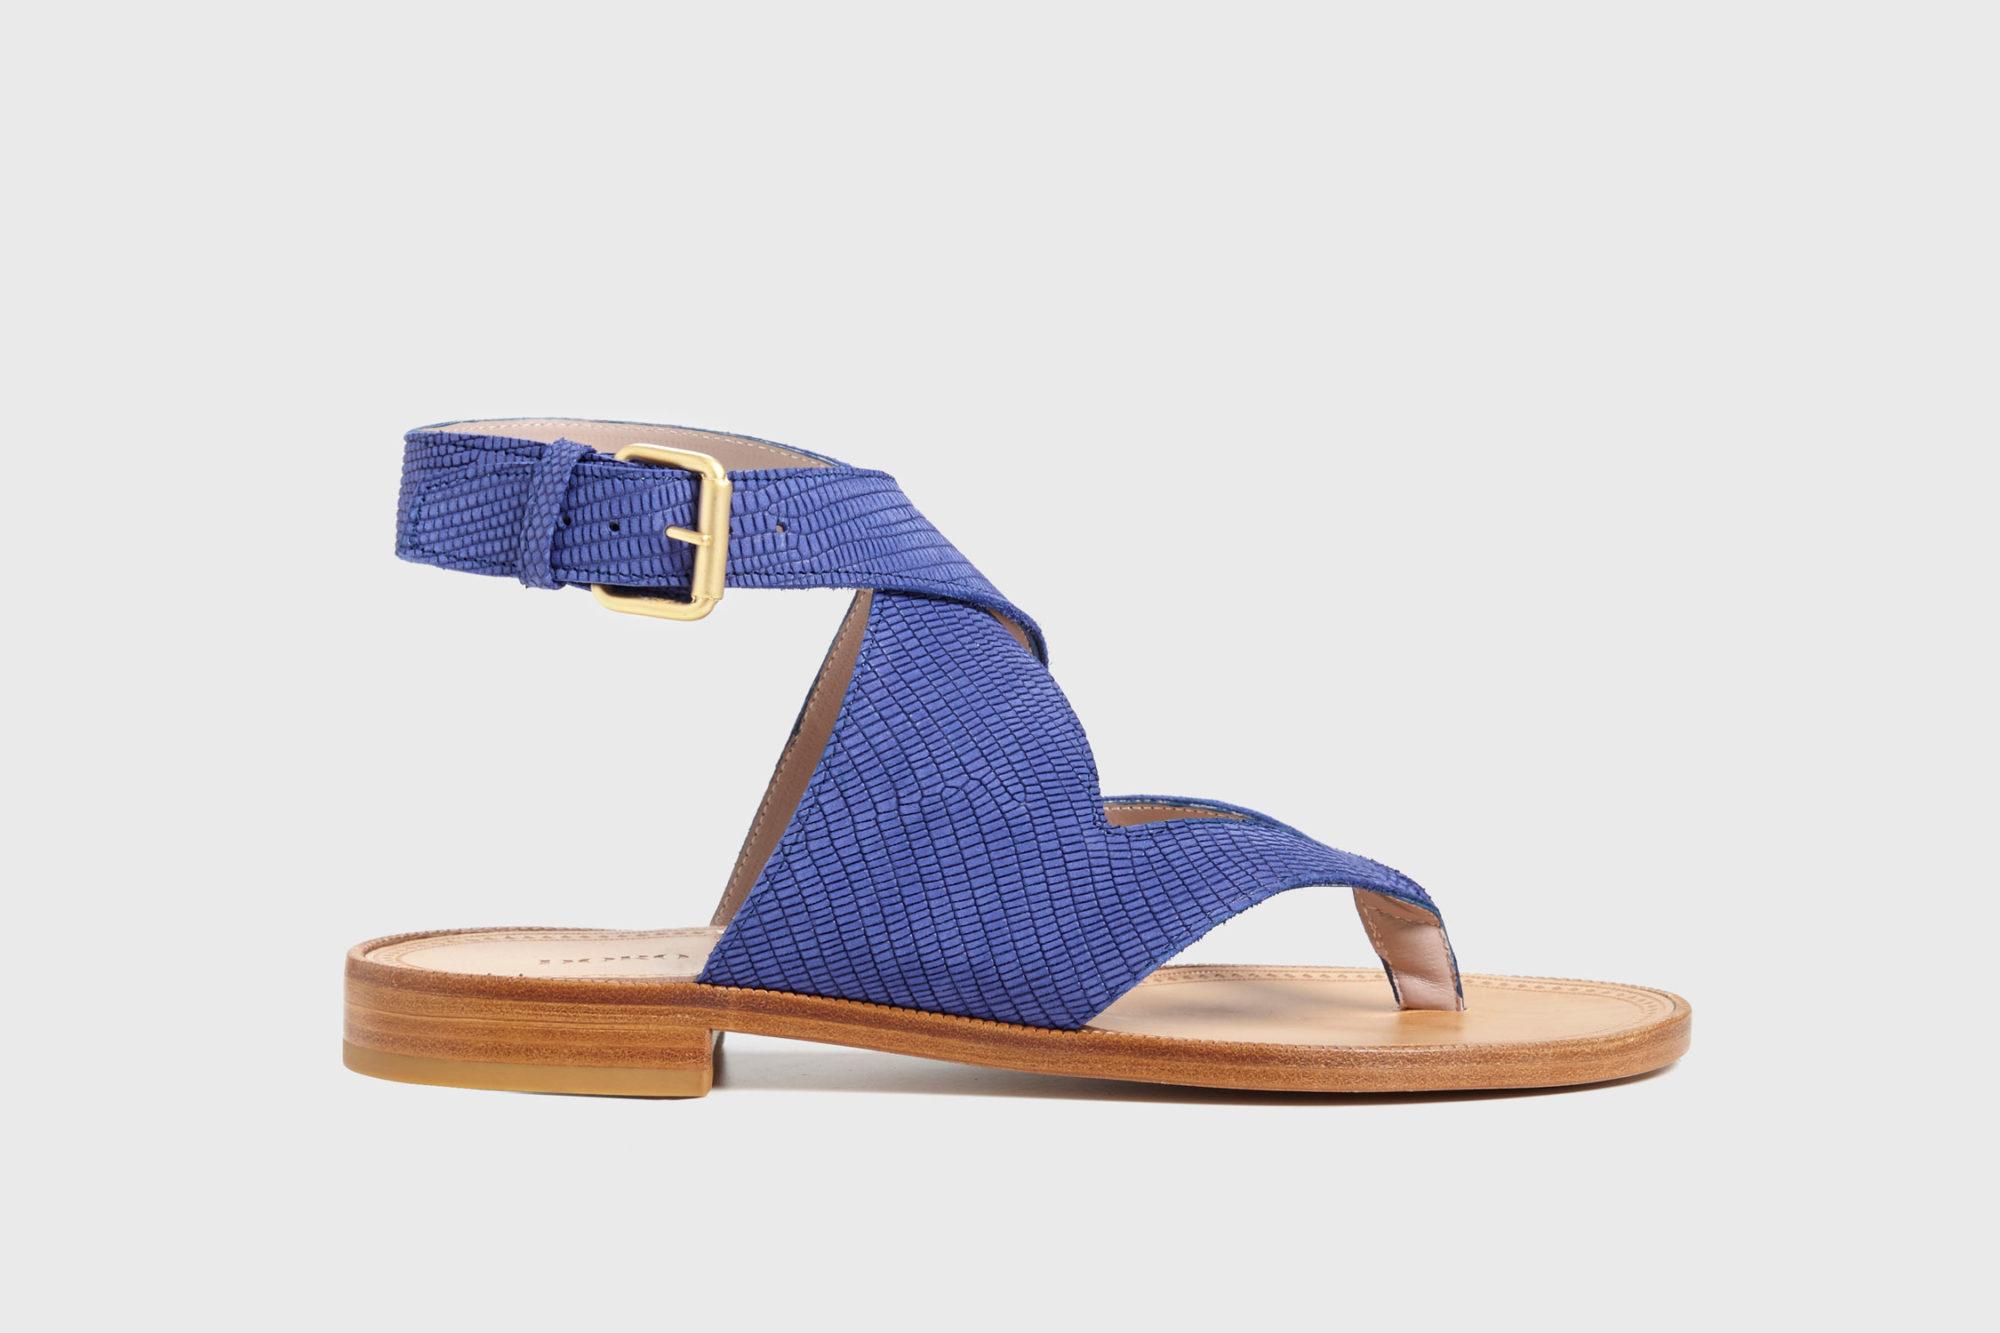 Dorotea sandalia plana Martina azul klein ss17 perfil